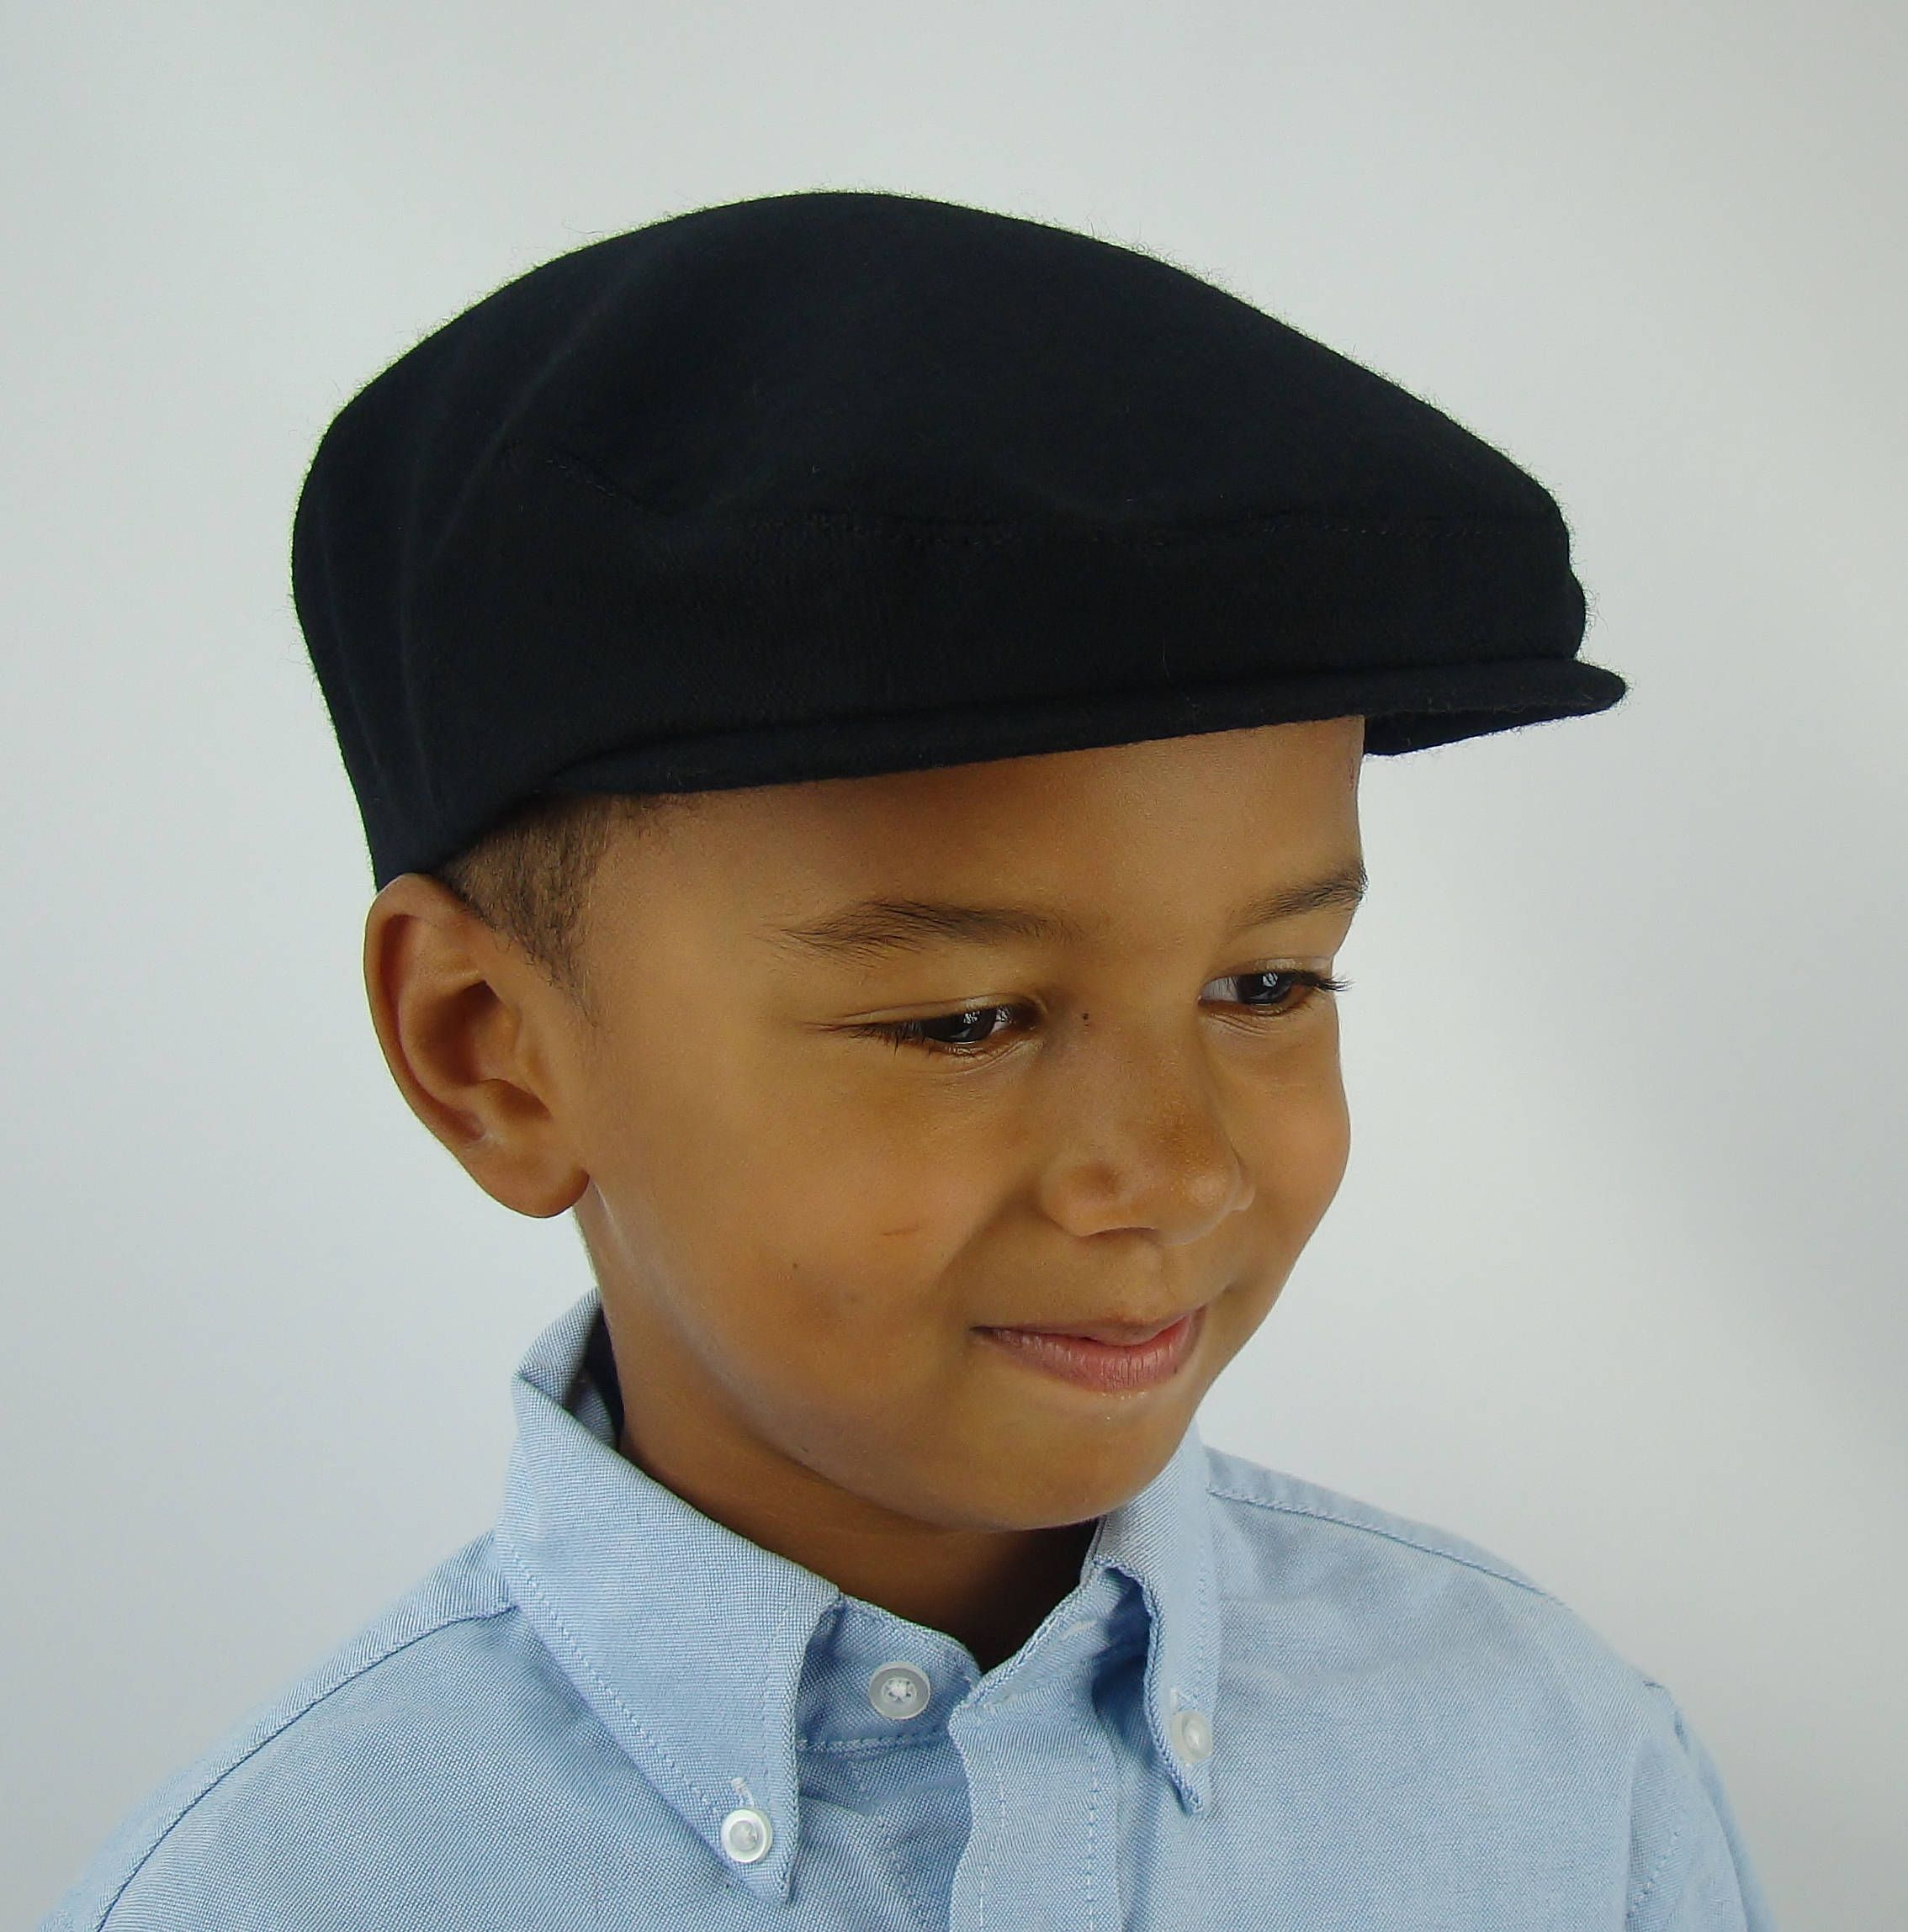 27502983b Black Wool Sixpence Ivy Hat - Flat Jeff Cap, Ivy Cap, Driving Cap ...